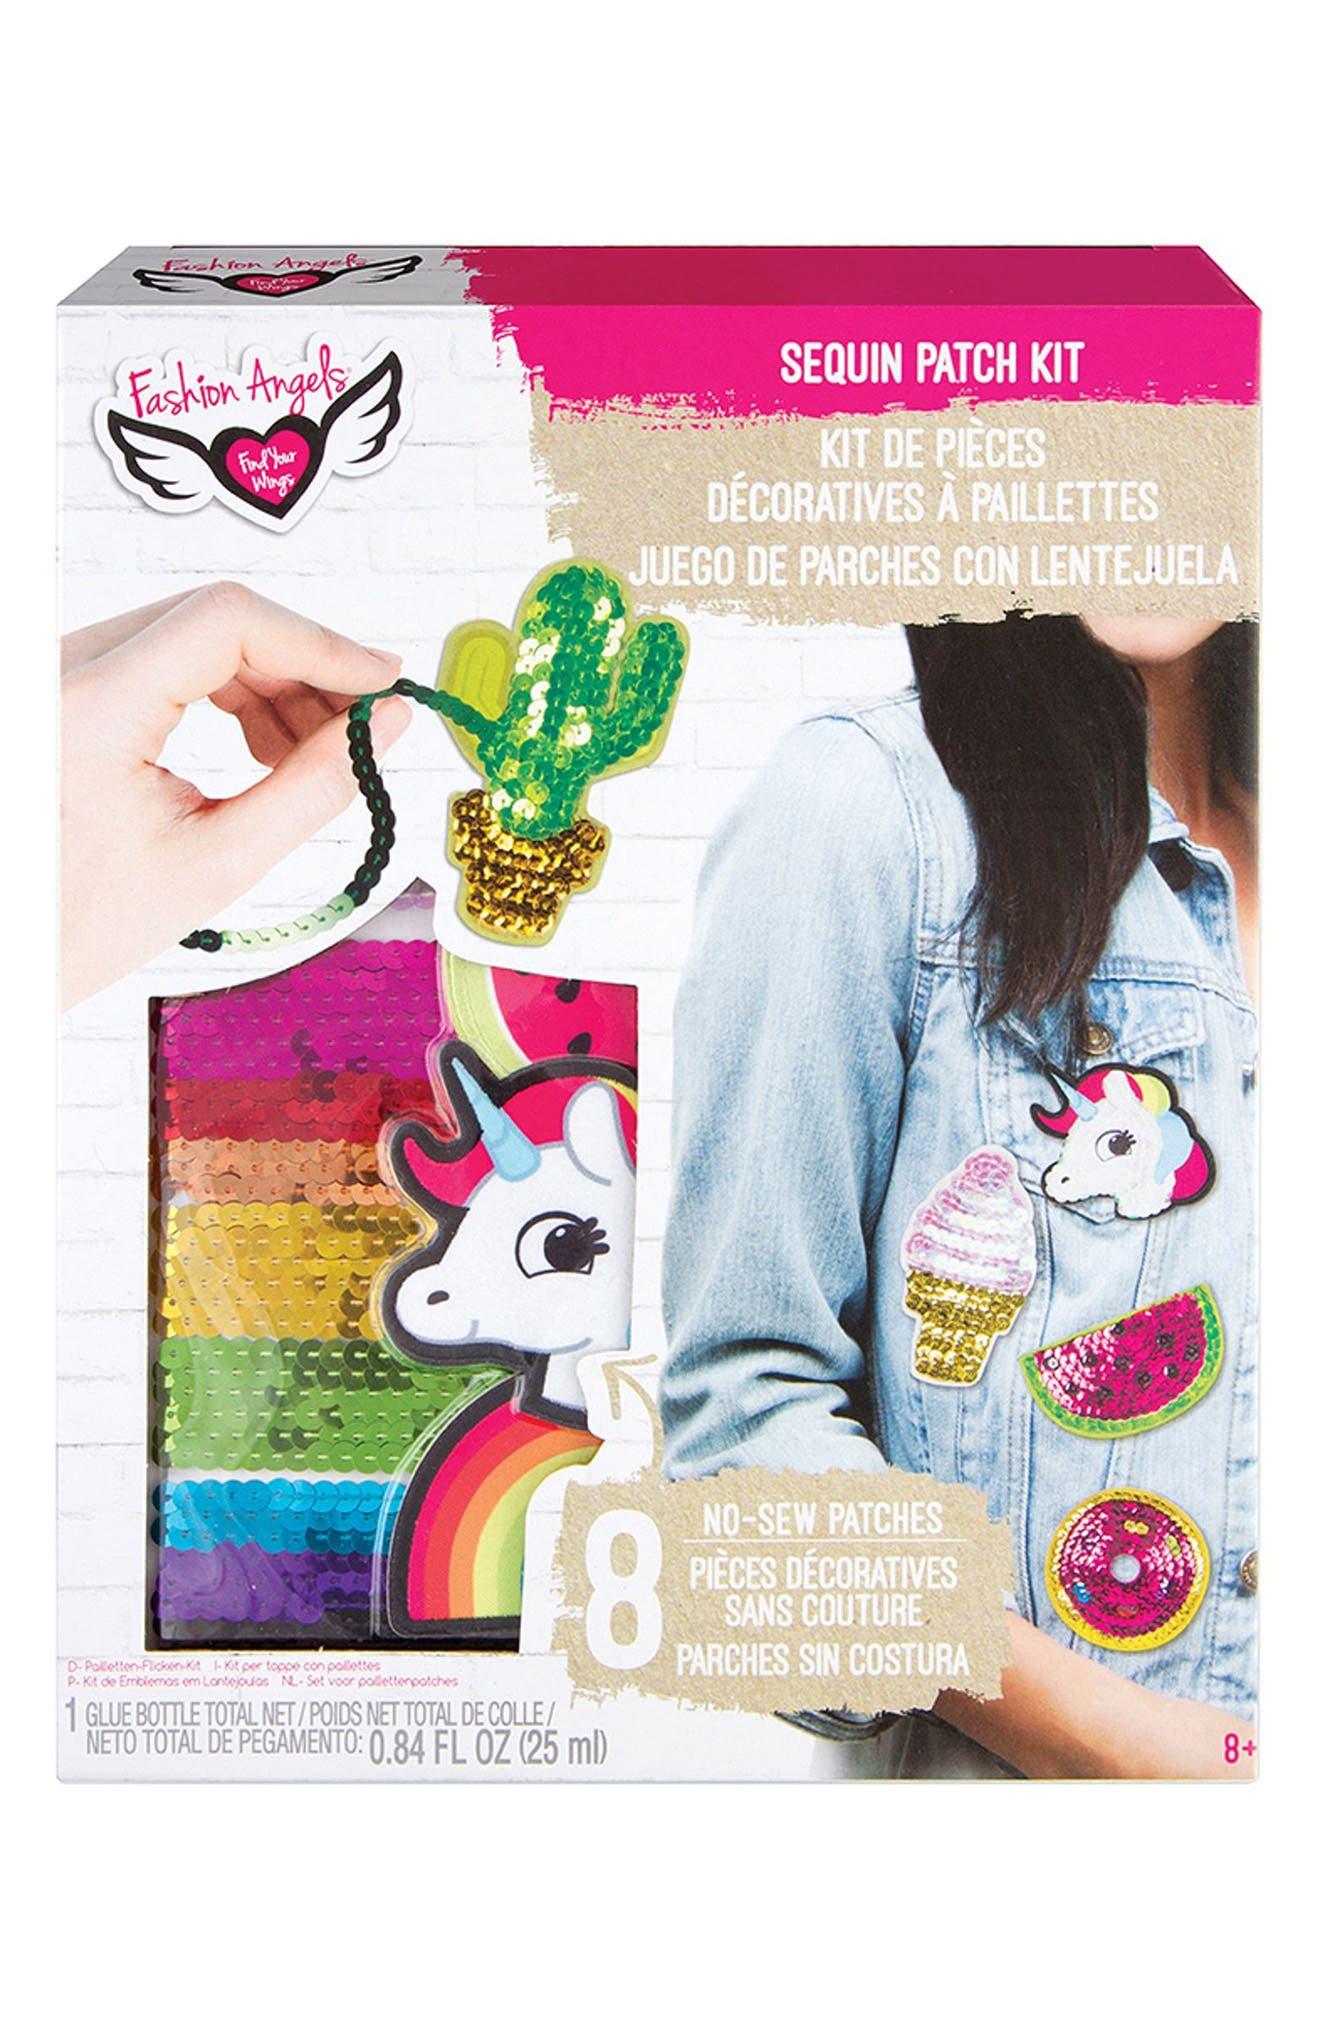 No-Sew Sequin Patch Kit,                             Main thumbnail 1, color,                             650